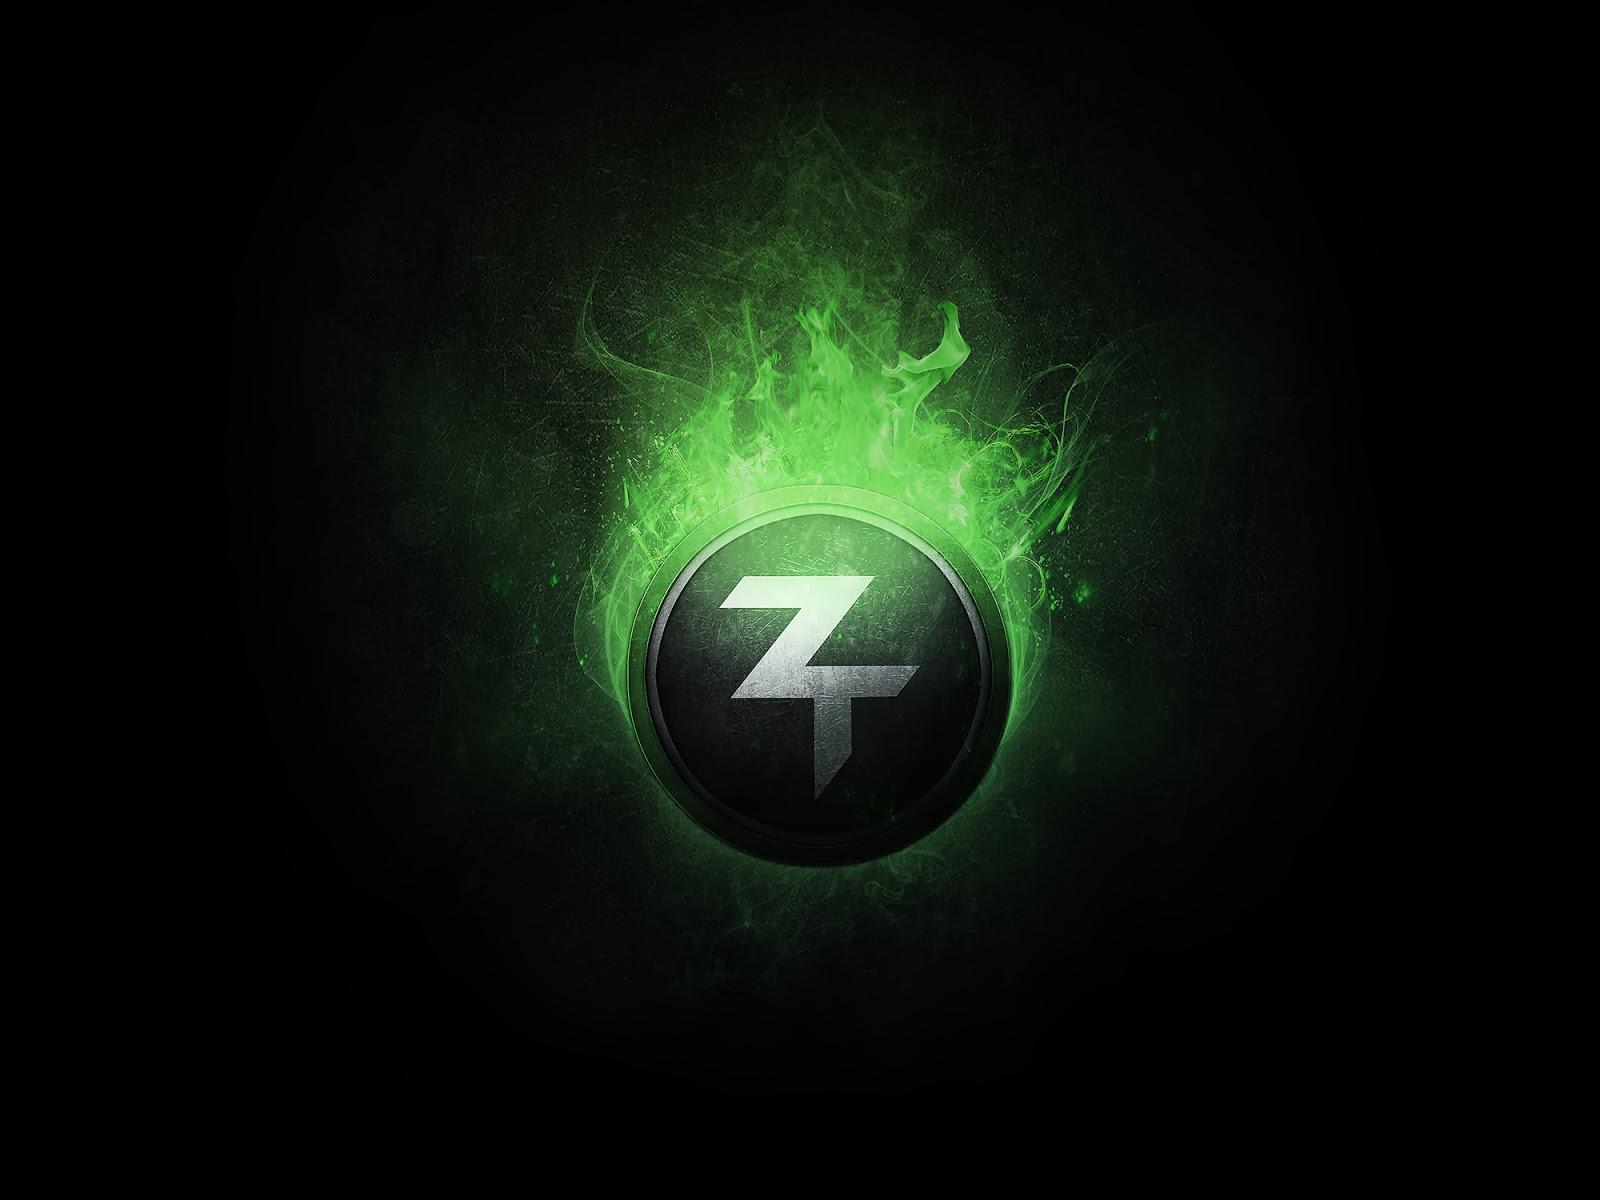 logo zerator gratuit